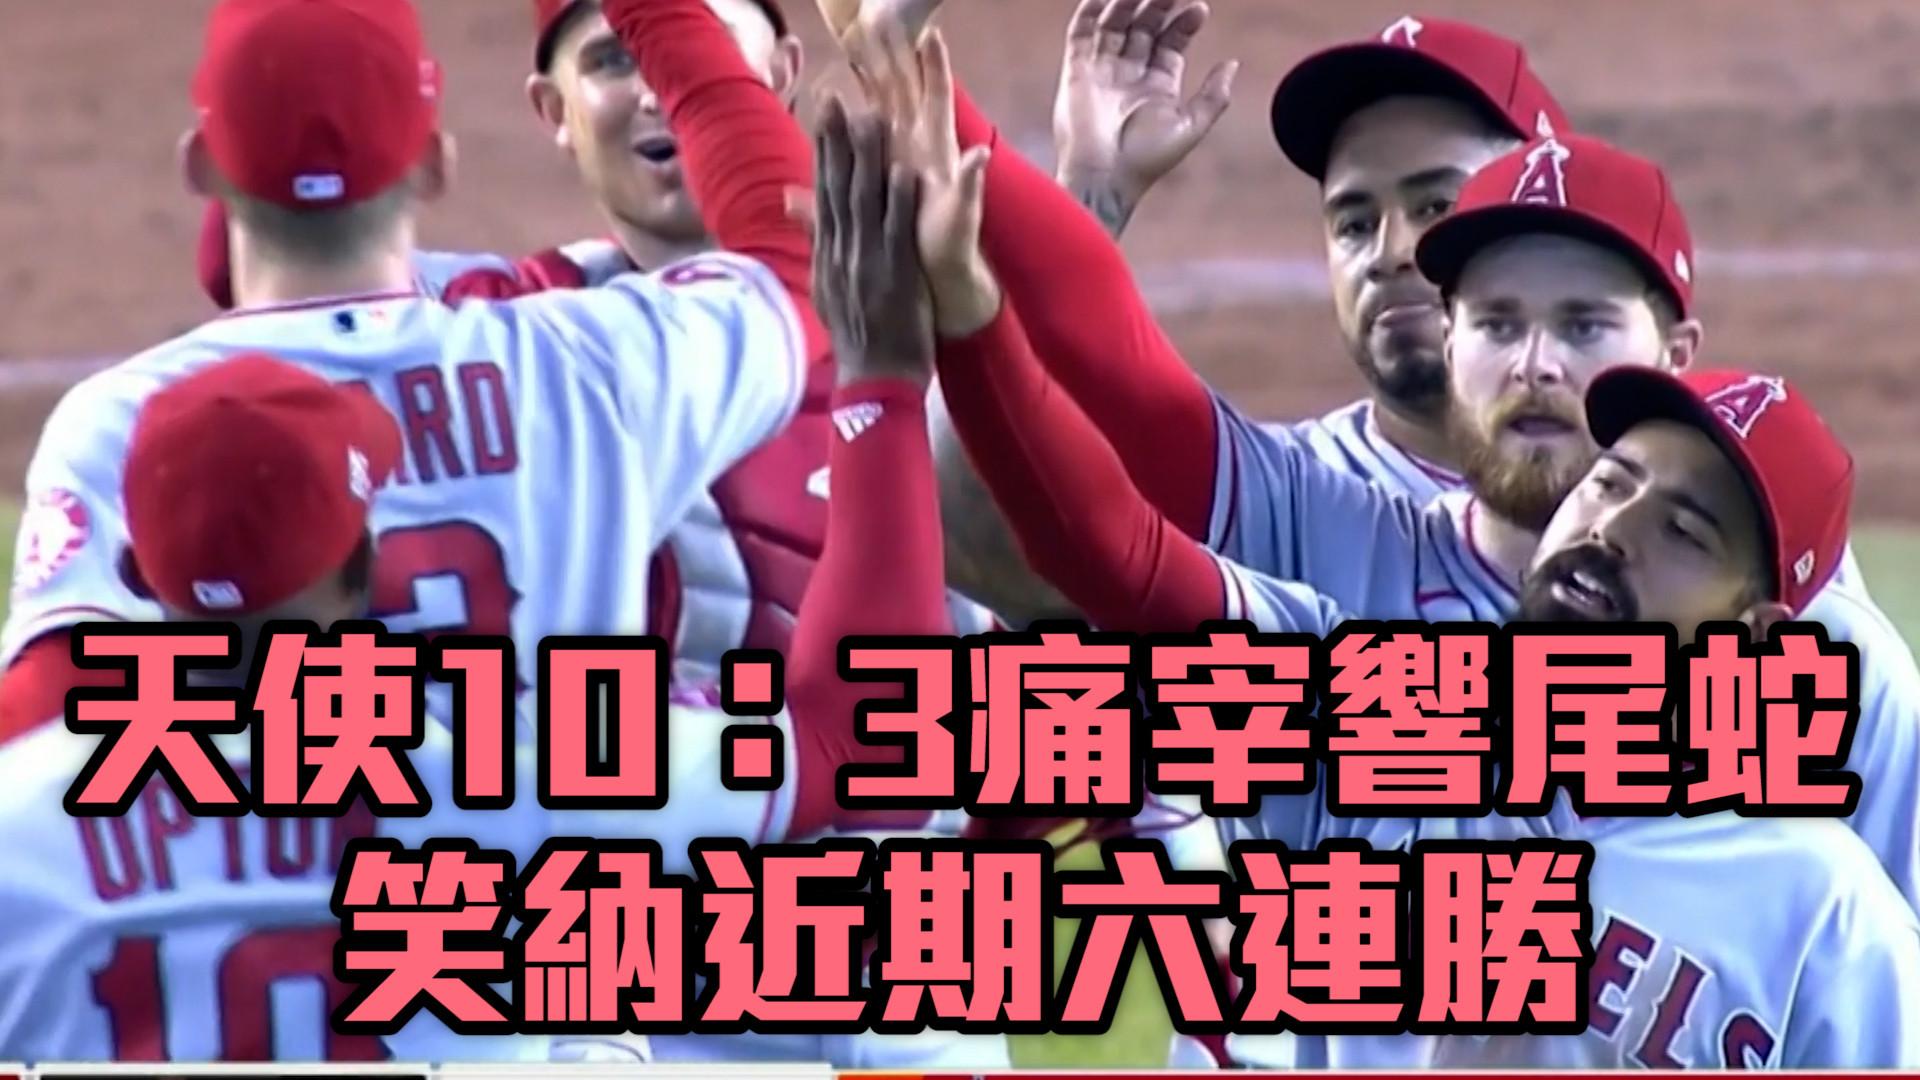 【MLB看愛爾達】天使10:3痛宰響尾蛇 笑納近期六連勝 06/14